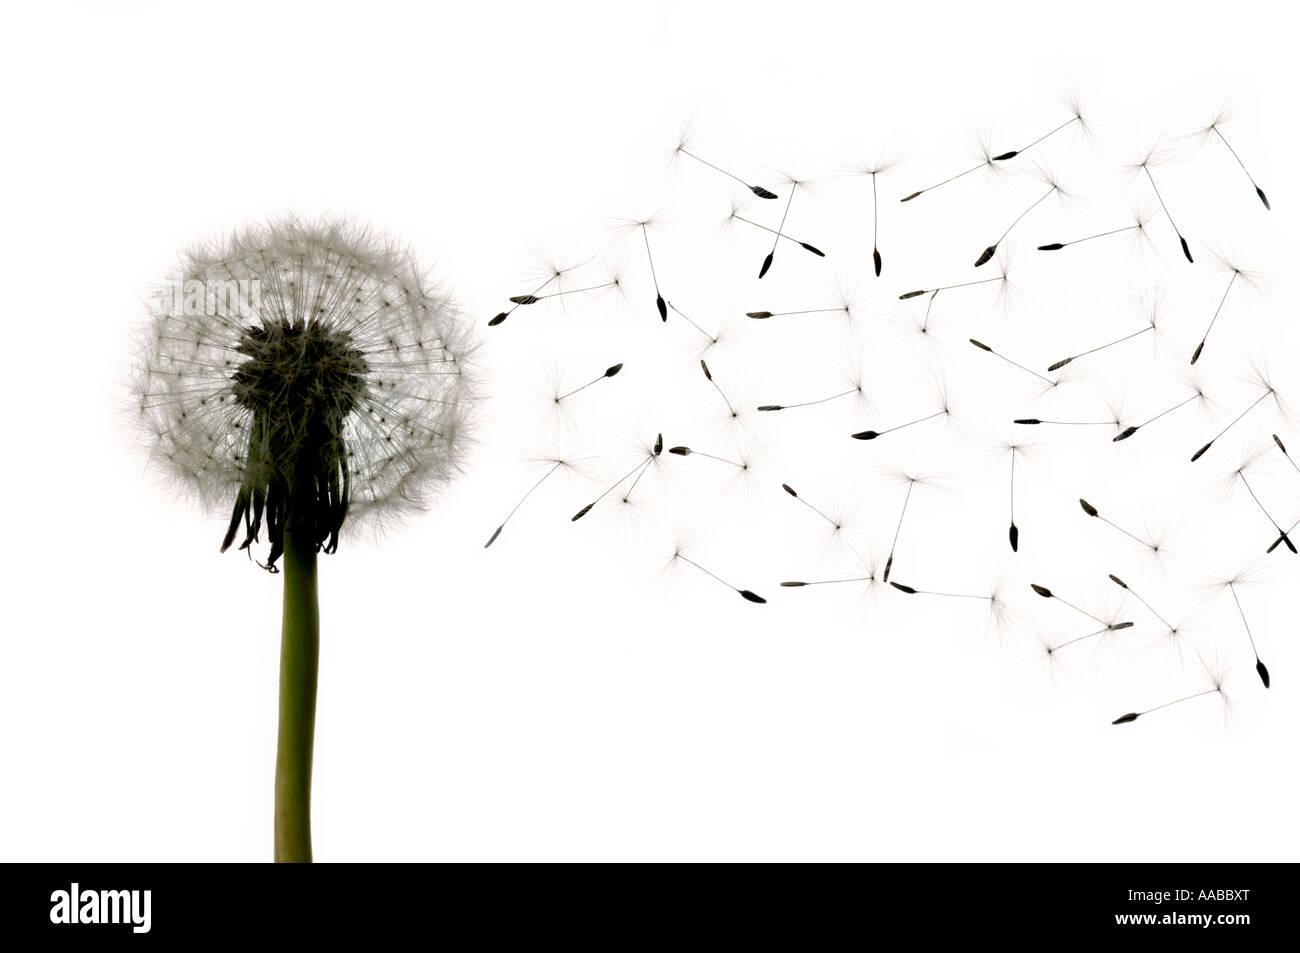 Dandelion head seeds - Stock Image